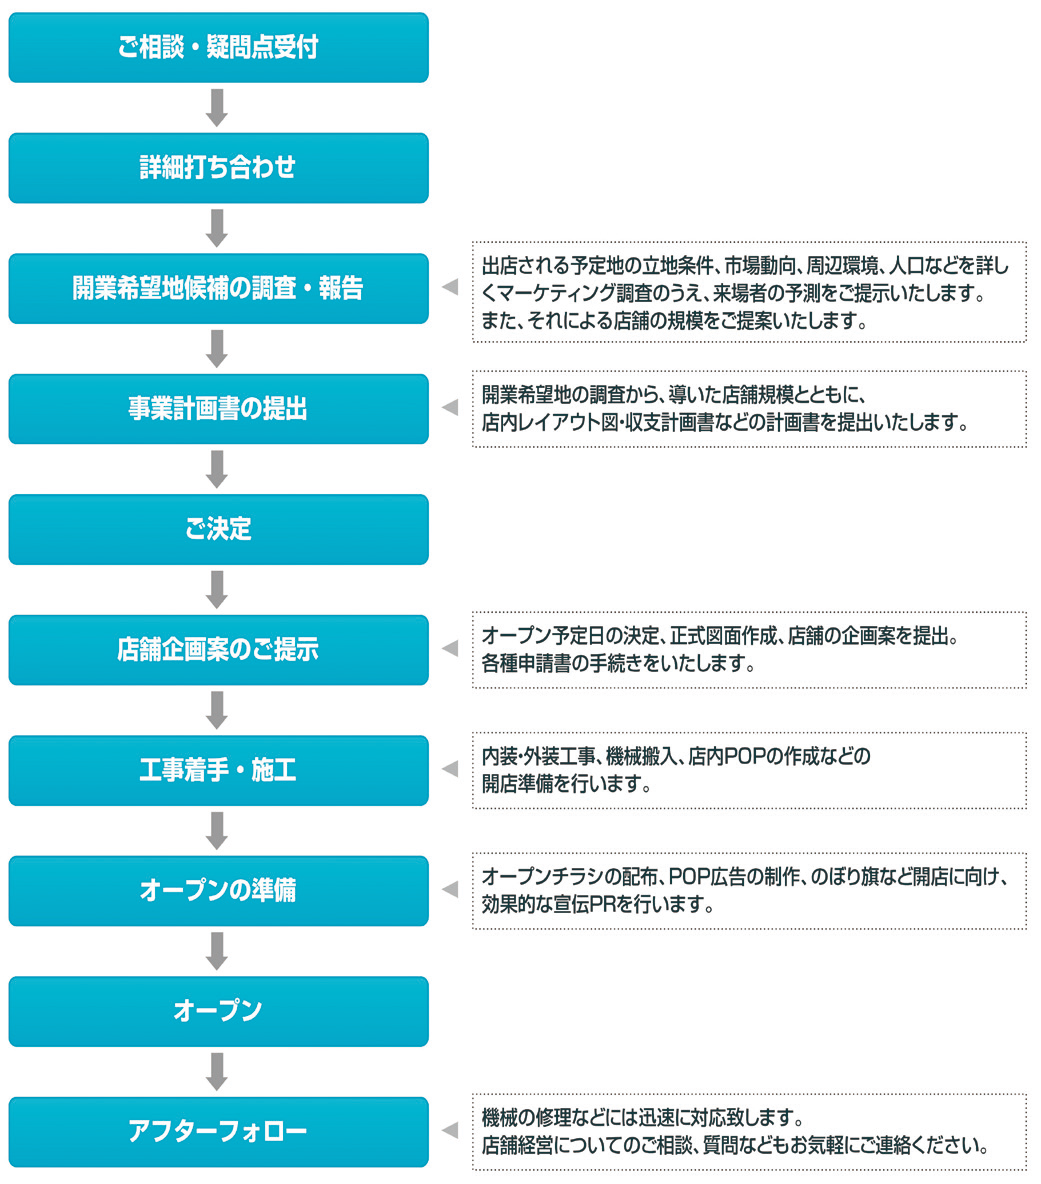 f:id:murakamihjm:20191227163826p:plain